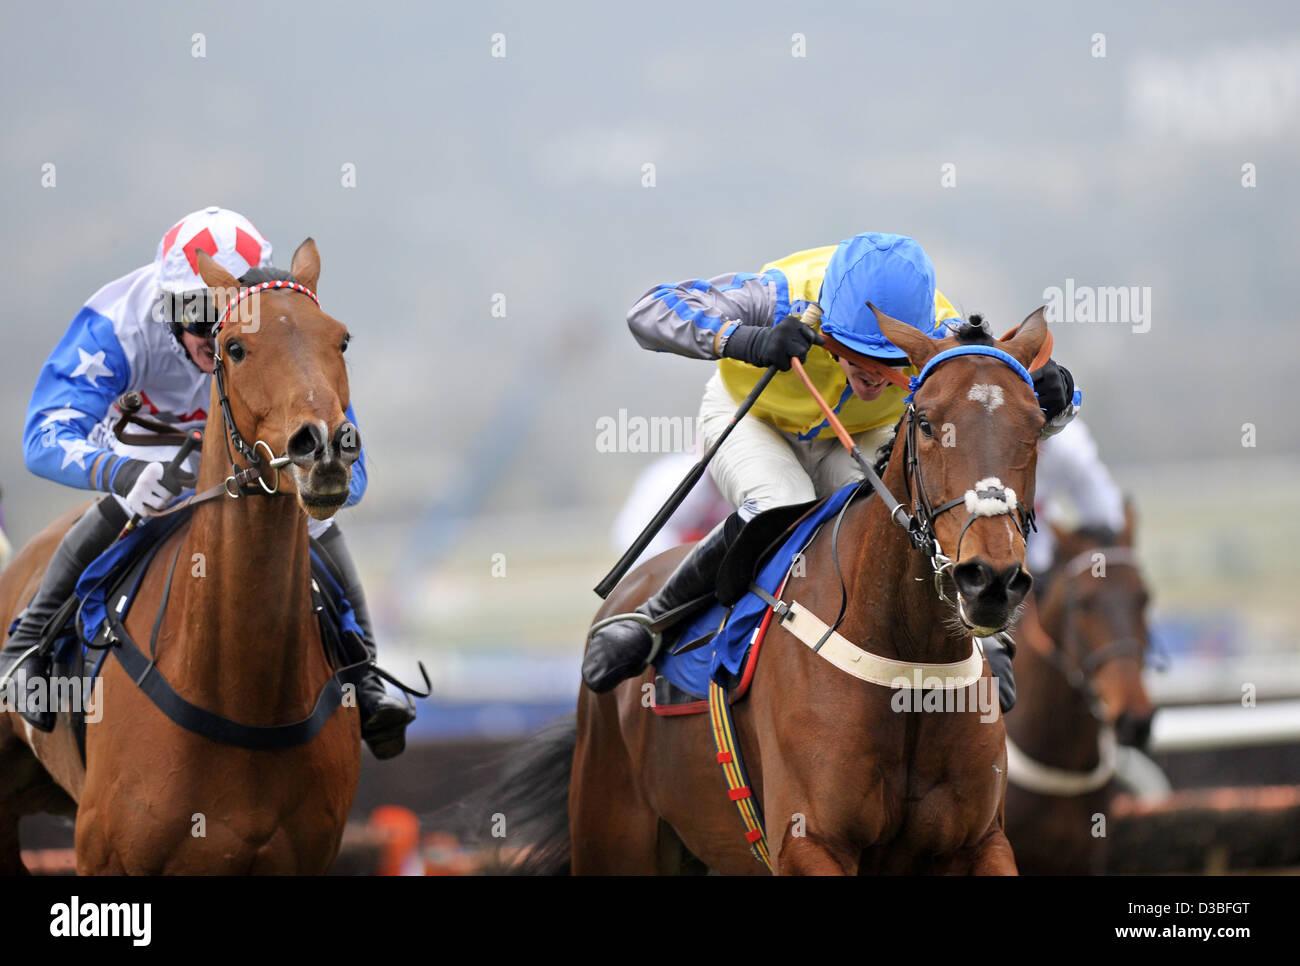 Jockeys race their horses during The Cheltenham Festival an annual horse racing event in England Stock Photo